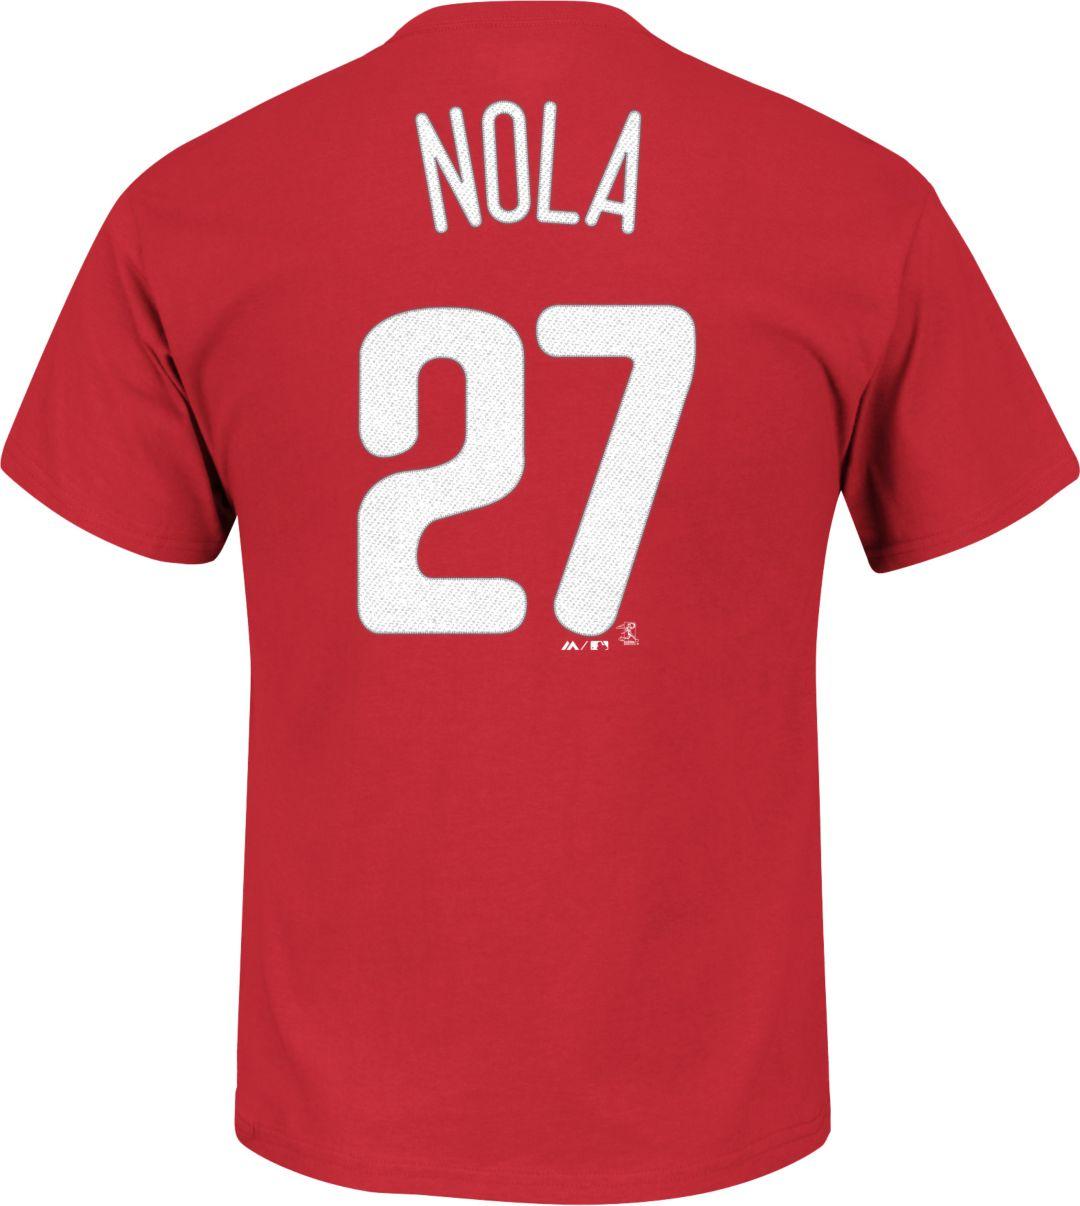 buy online 3217e 500e2 Majestic Men's Philadelphia Phillies Aaron Nola #27 Red T-Shirt